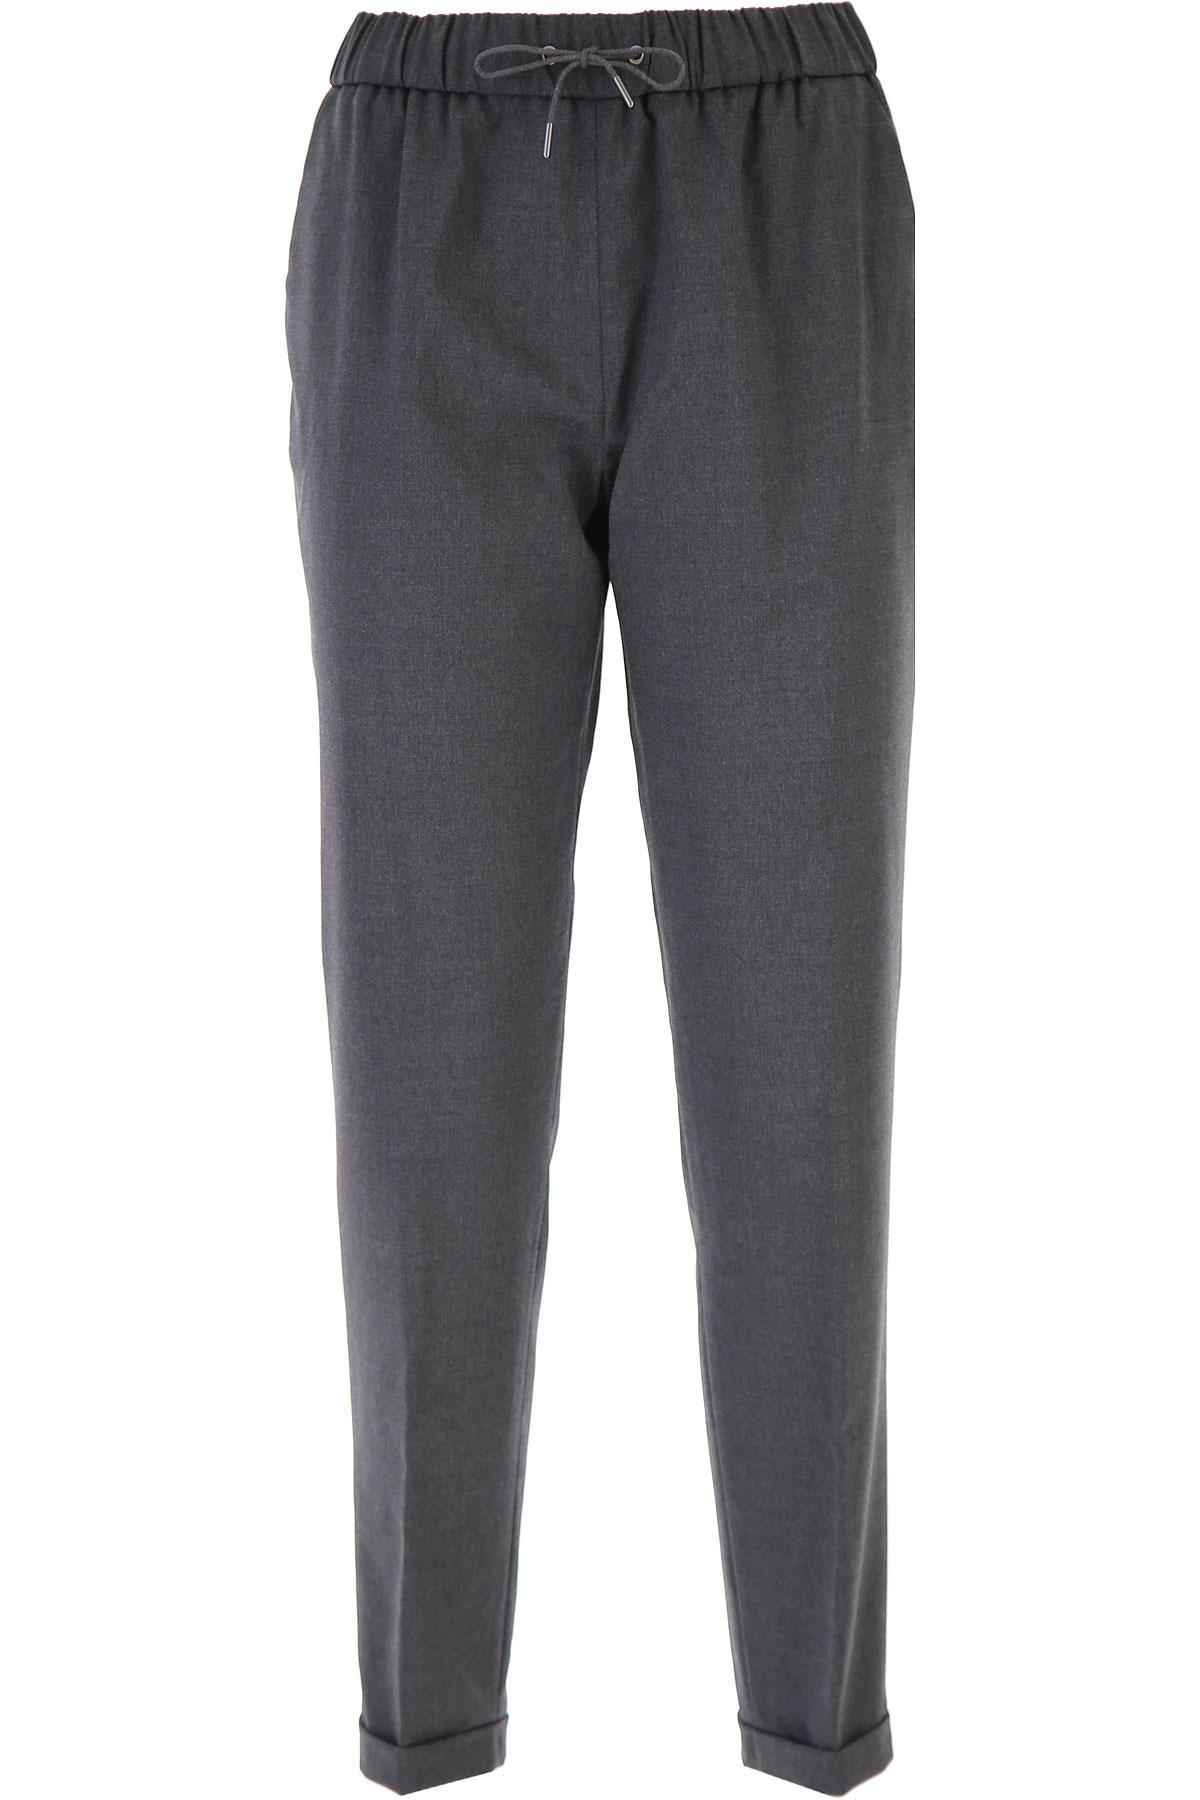 Fabiana Filippi Pants for Women On Sale, antracite, Wool, 2019, 26 28 30